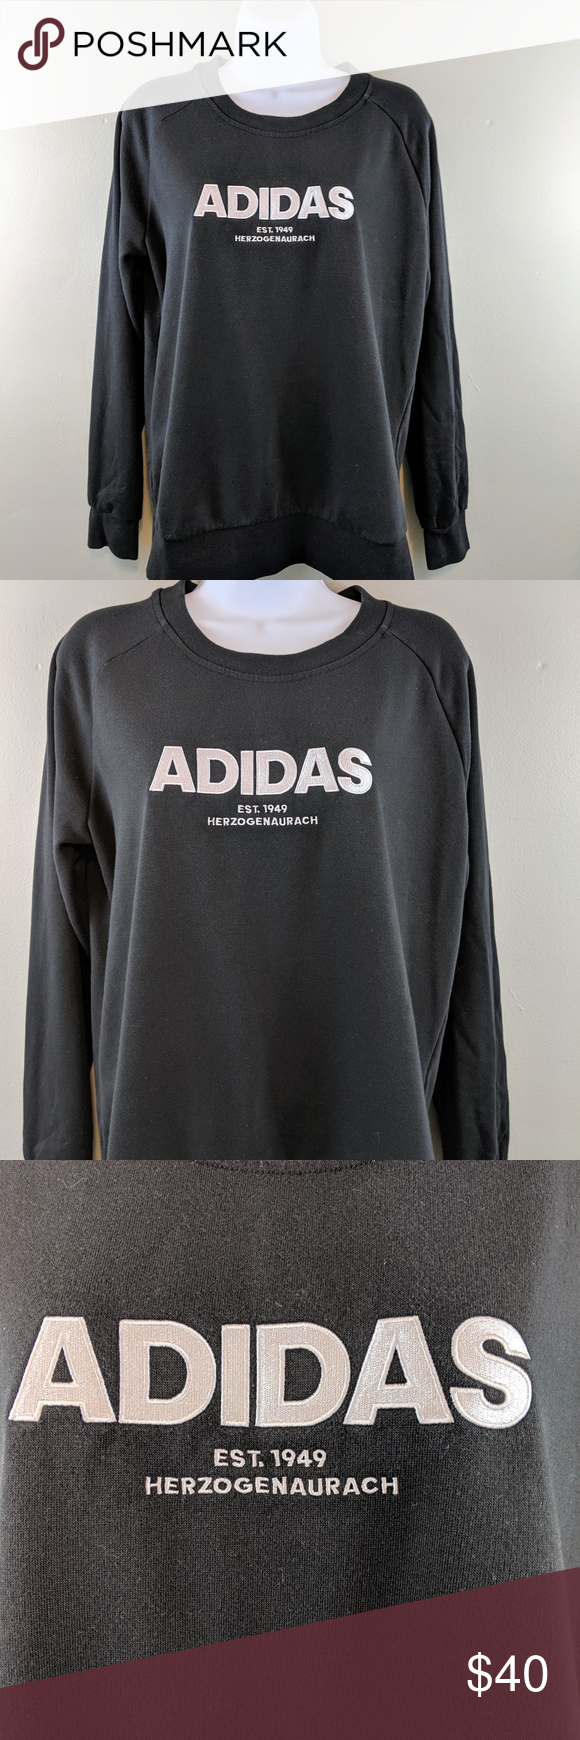 "Black Adidas Crewneck Sweater ""ADIDAS EST. 1949"